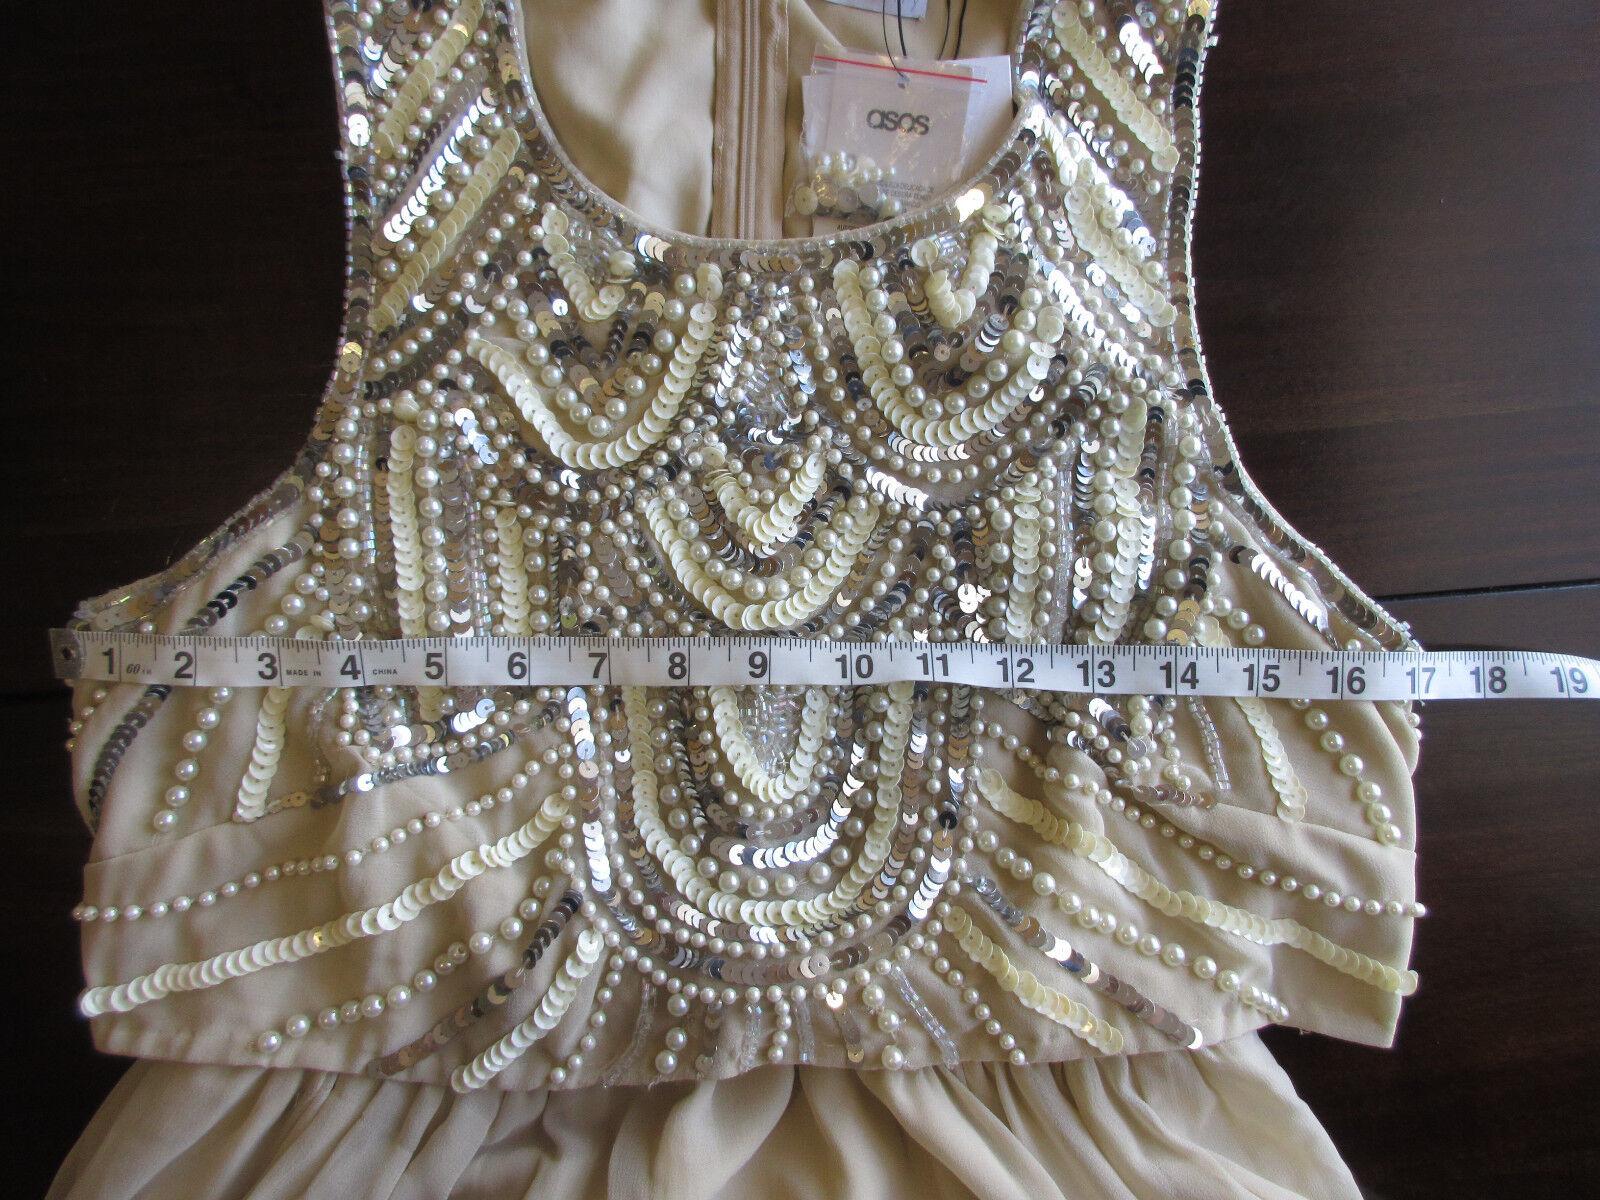 NEW ASOS Maternity Cream  Embellished Top Midi Evening Dress  sz 6 US